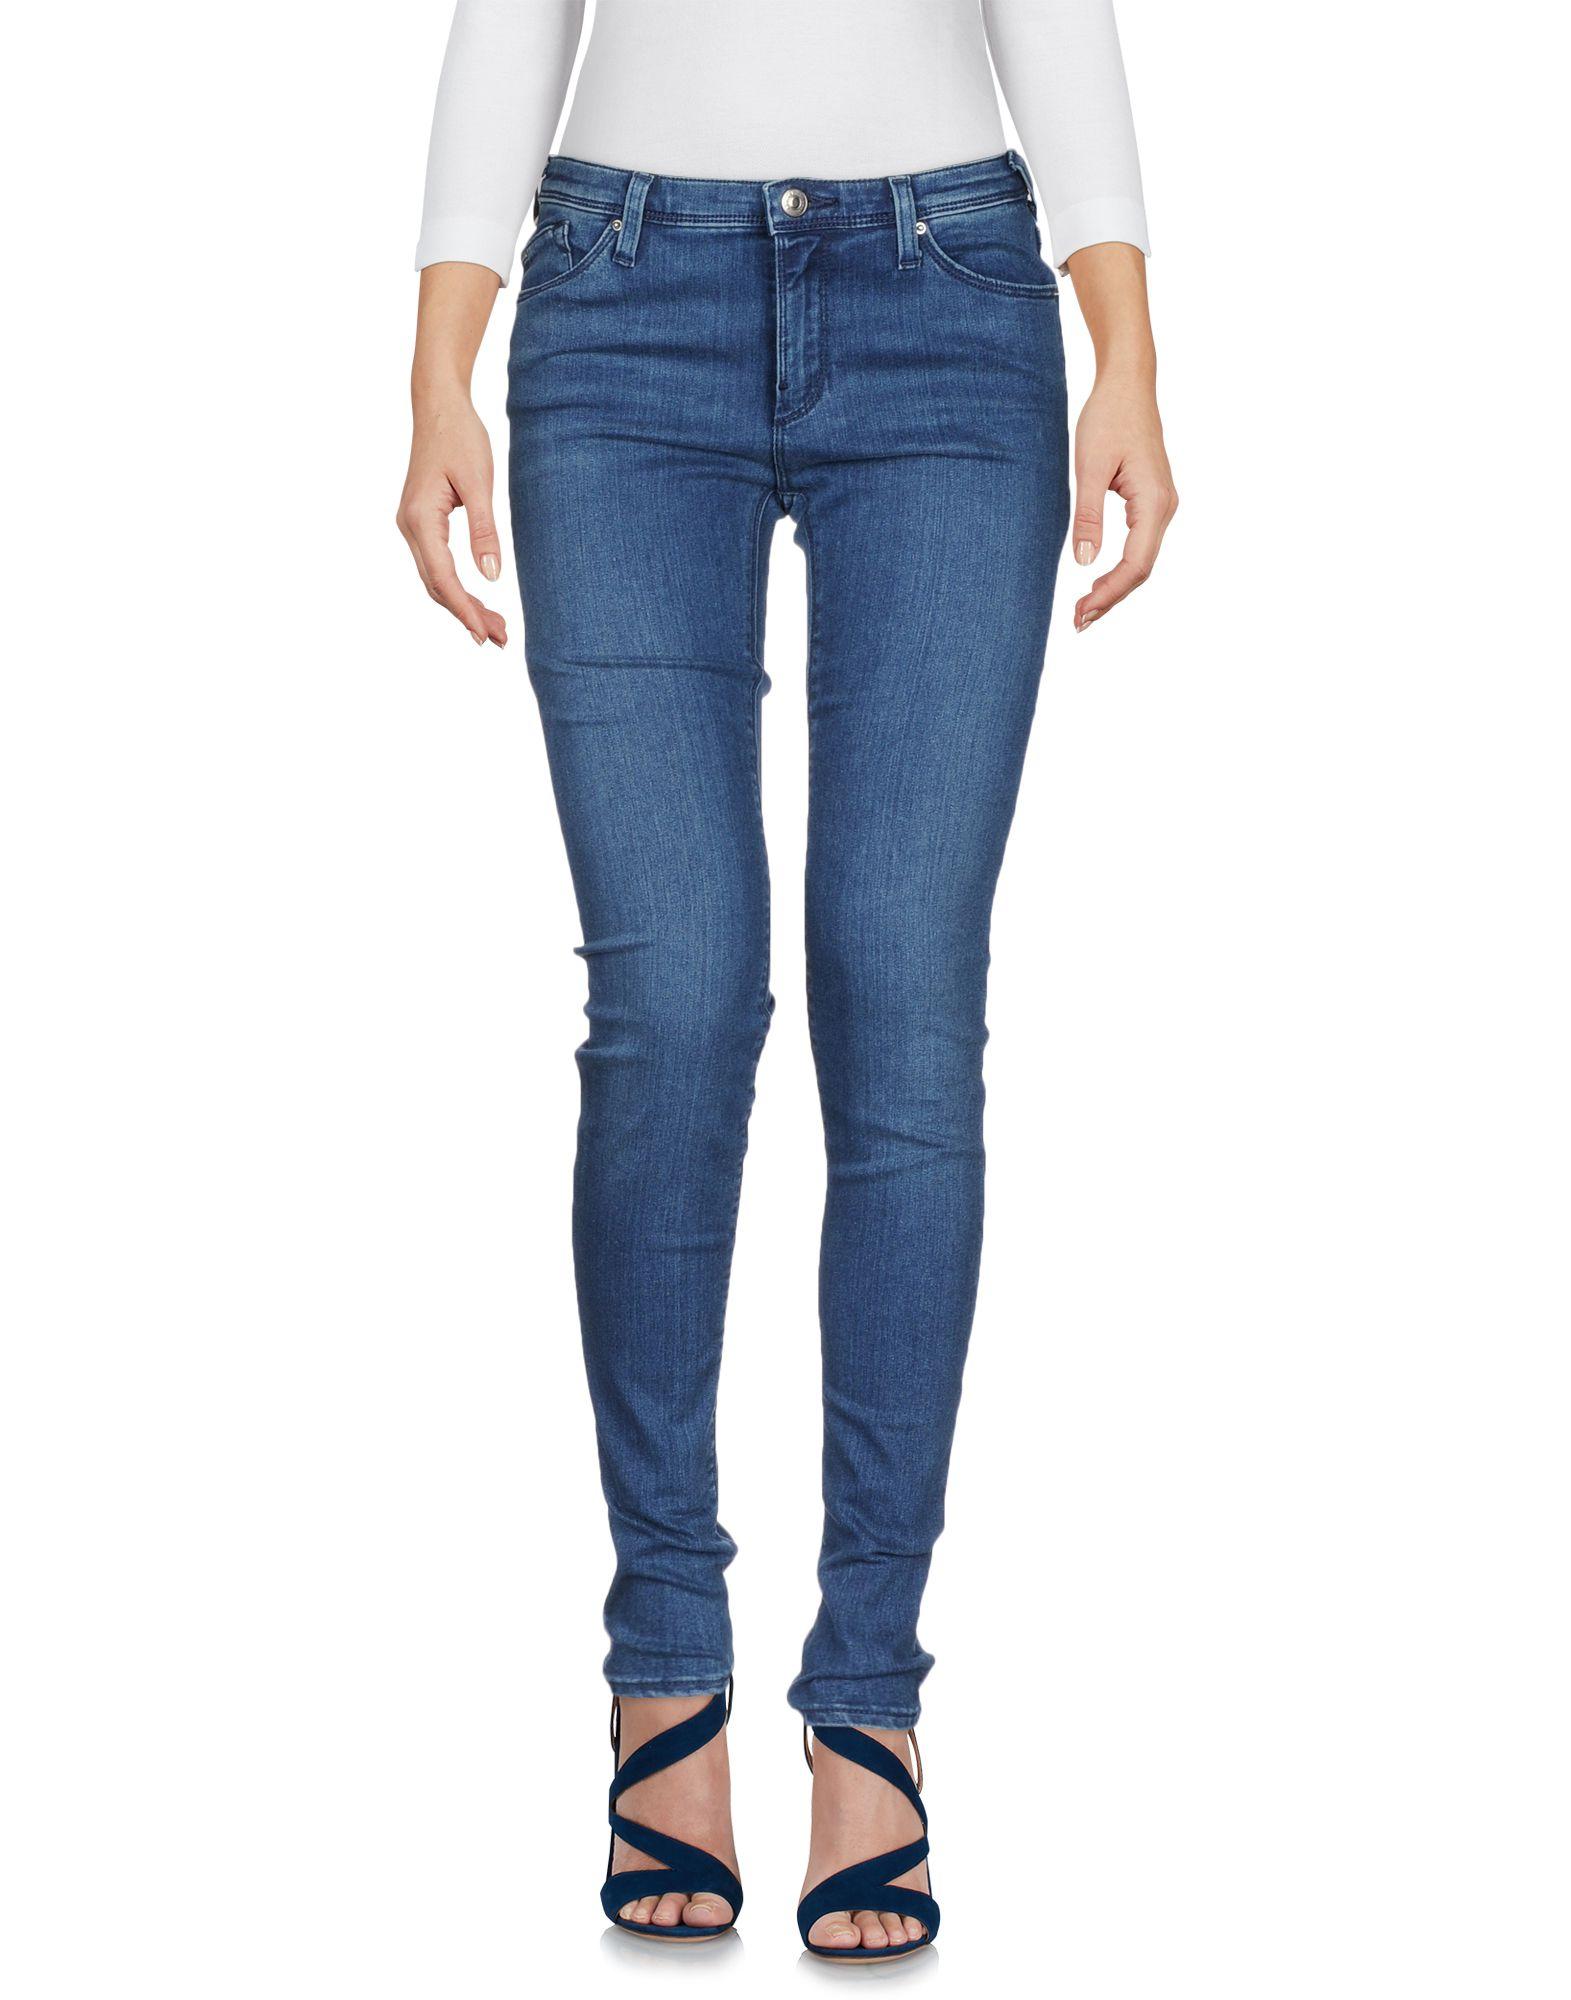 Pantaloni Jeans Armani Jeans donna - - 42669931TG  Spielraum